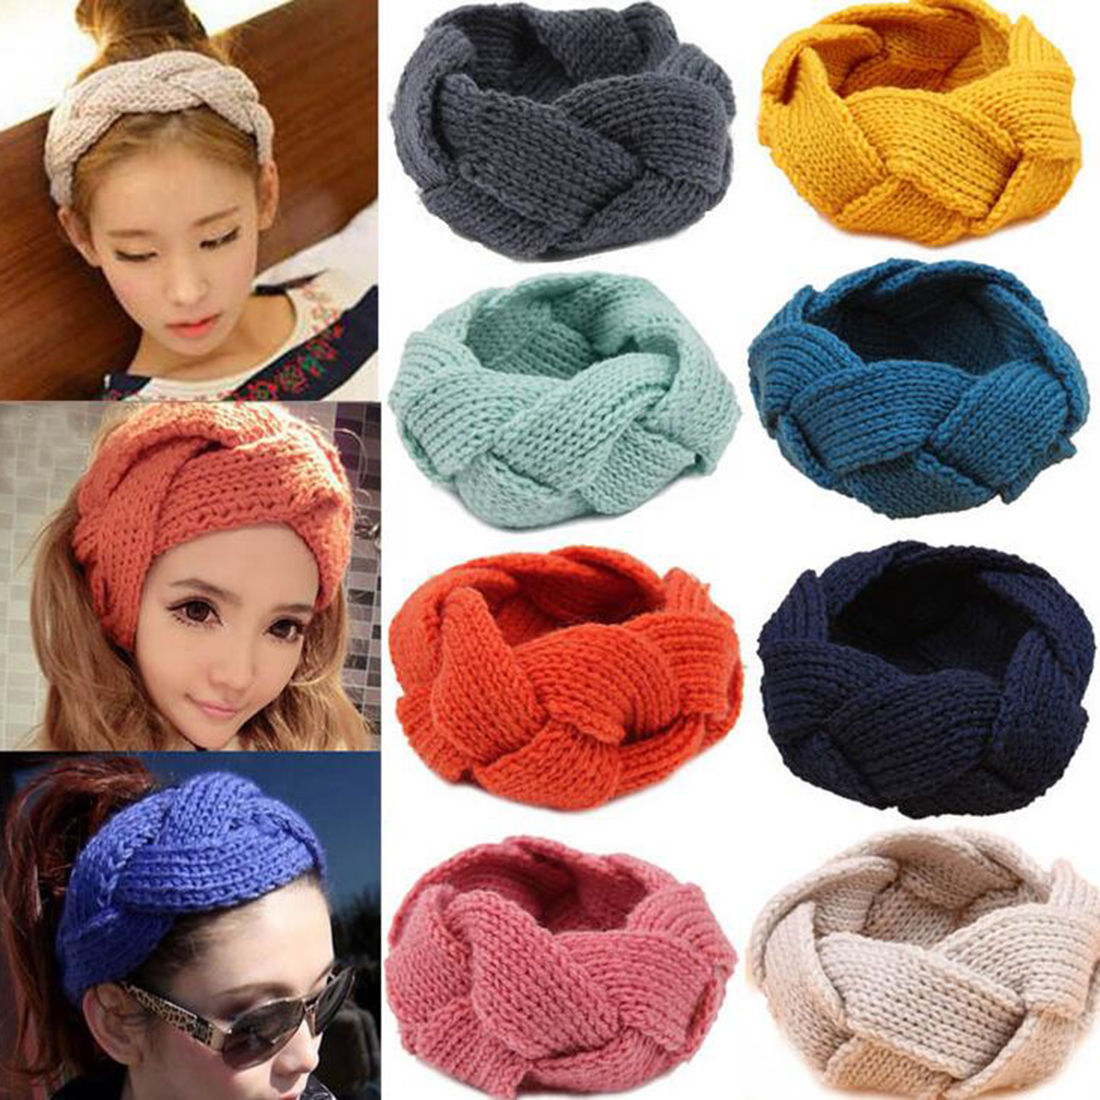 734a0909788 Detail Feedback Questions about Women s Wool Crochet Turban Headband Winter  Warm Elastic Hairband Head Wrap Bandage Headbands Headwear Girls Hair ...